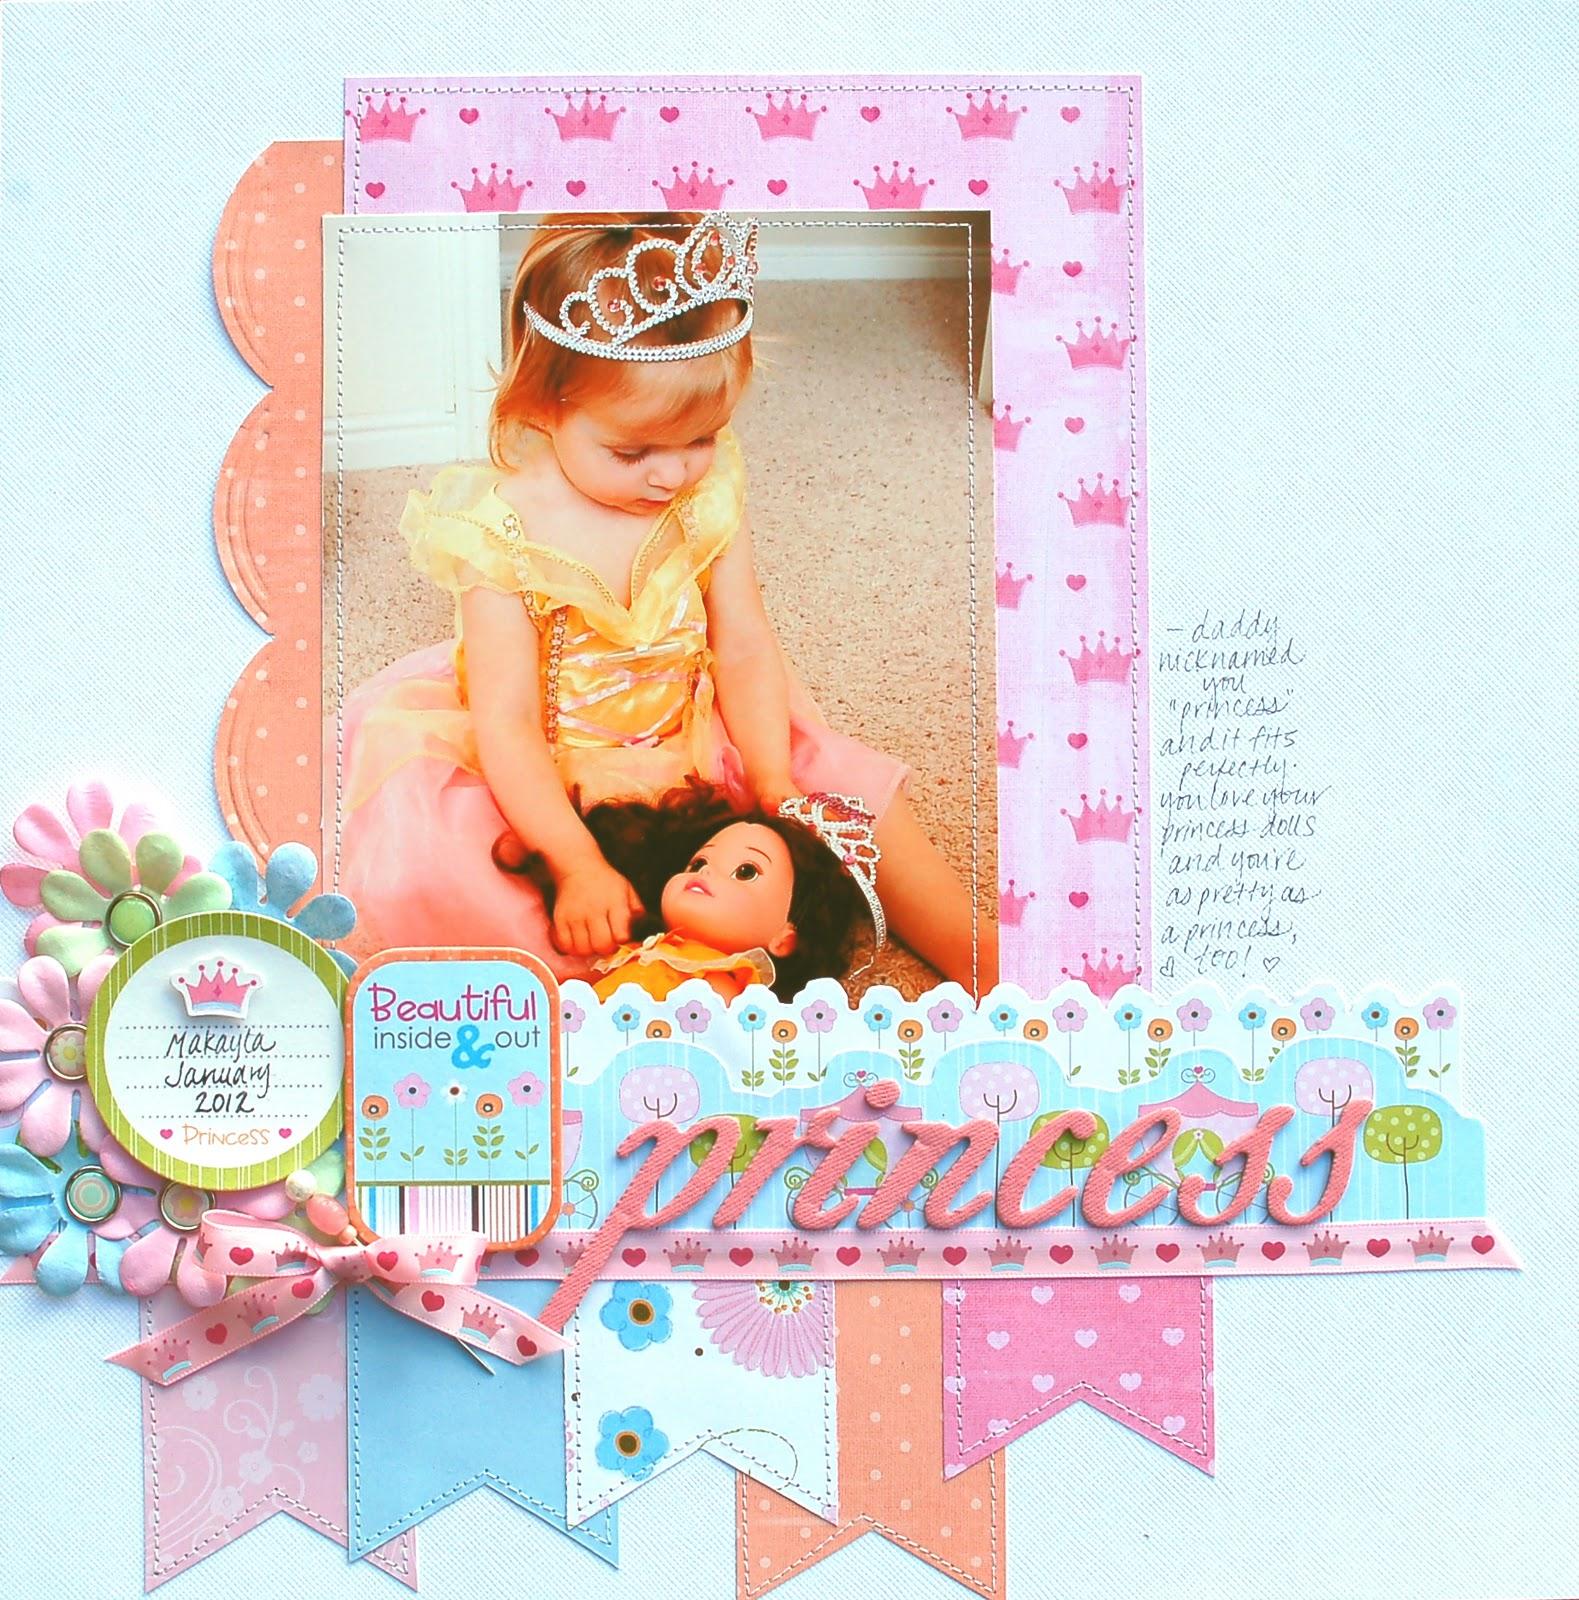 http://3.bp.blogspot.com/-lfOxPV-LNCc/Tyi9049XPCI/AAAAAAAAB5g/sjXD2EKrb28/s1600/2012-02+Princess+Layout+full+size.jpg